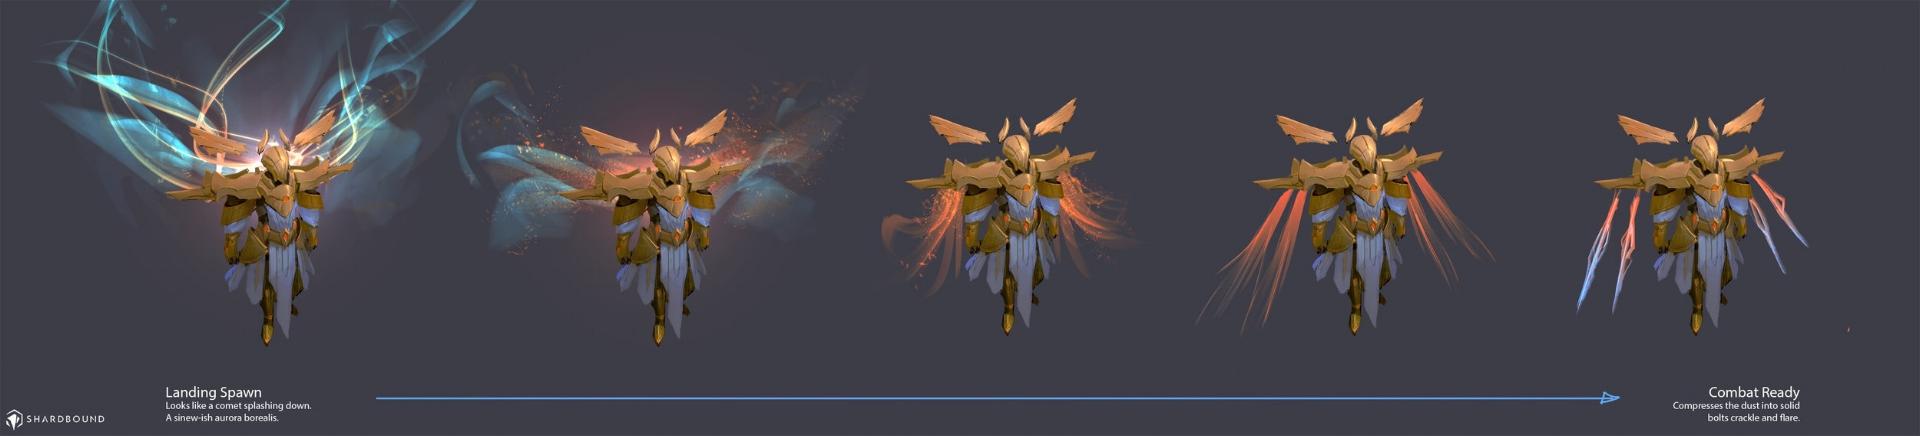 Spawning VFX Concept1.jpg